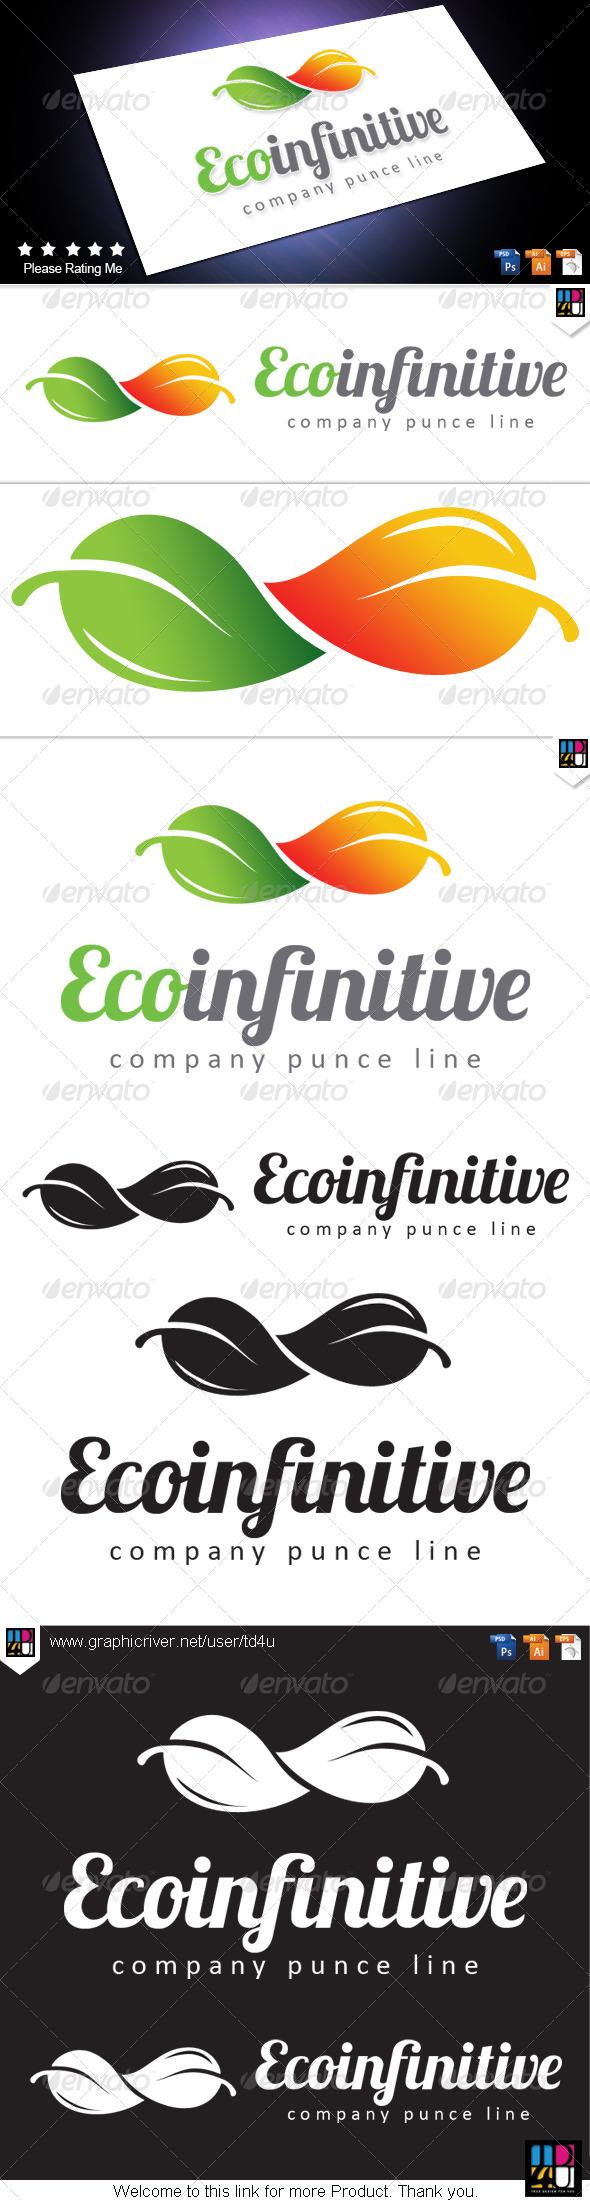 GraphicRiver Eco Infinitive 7060989